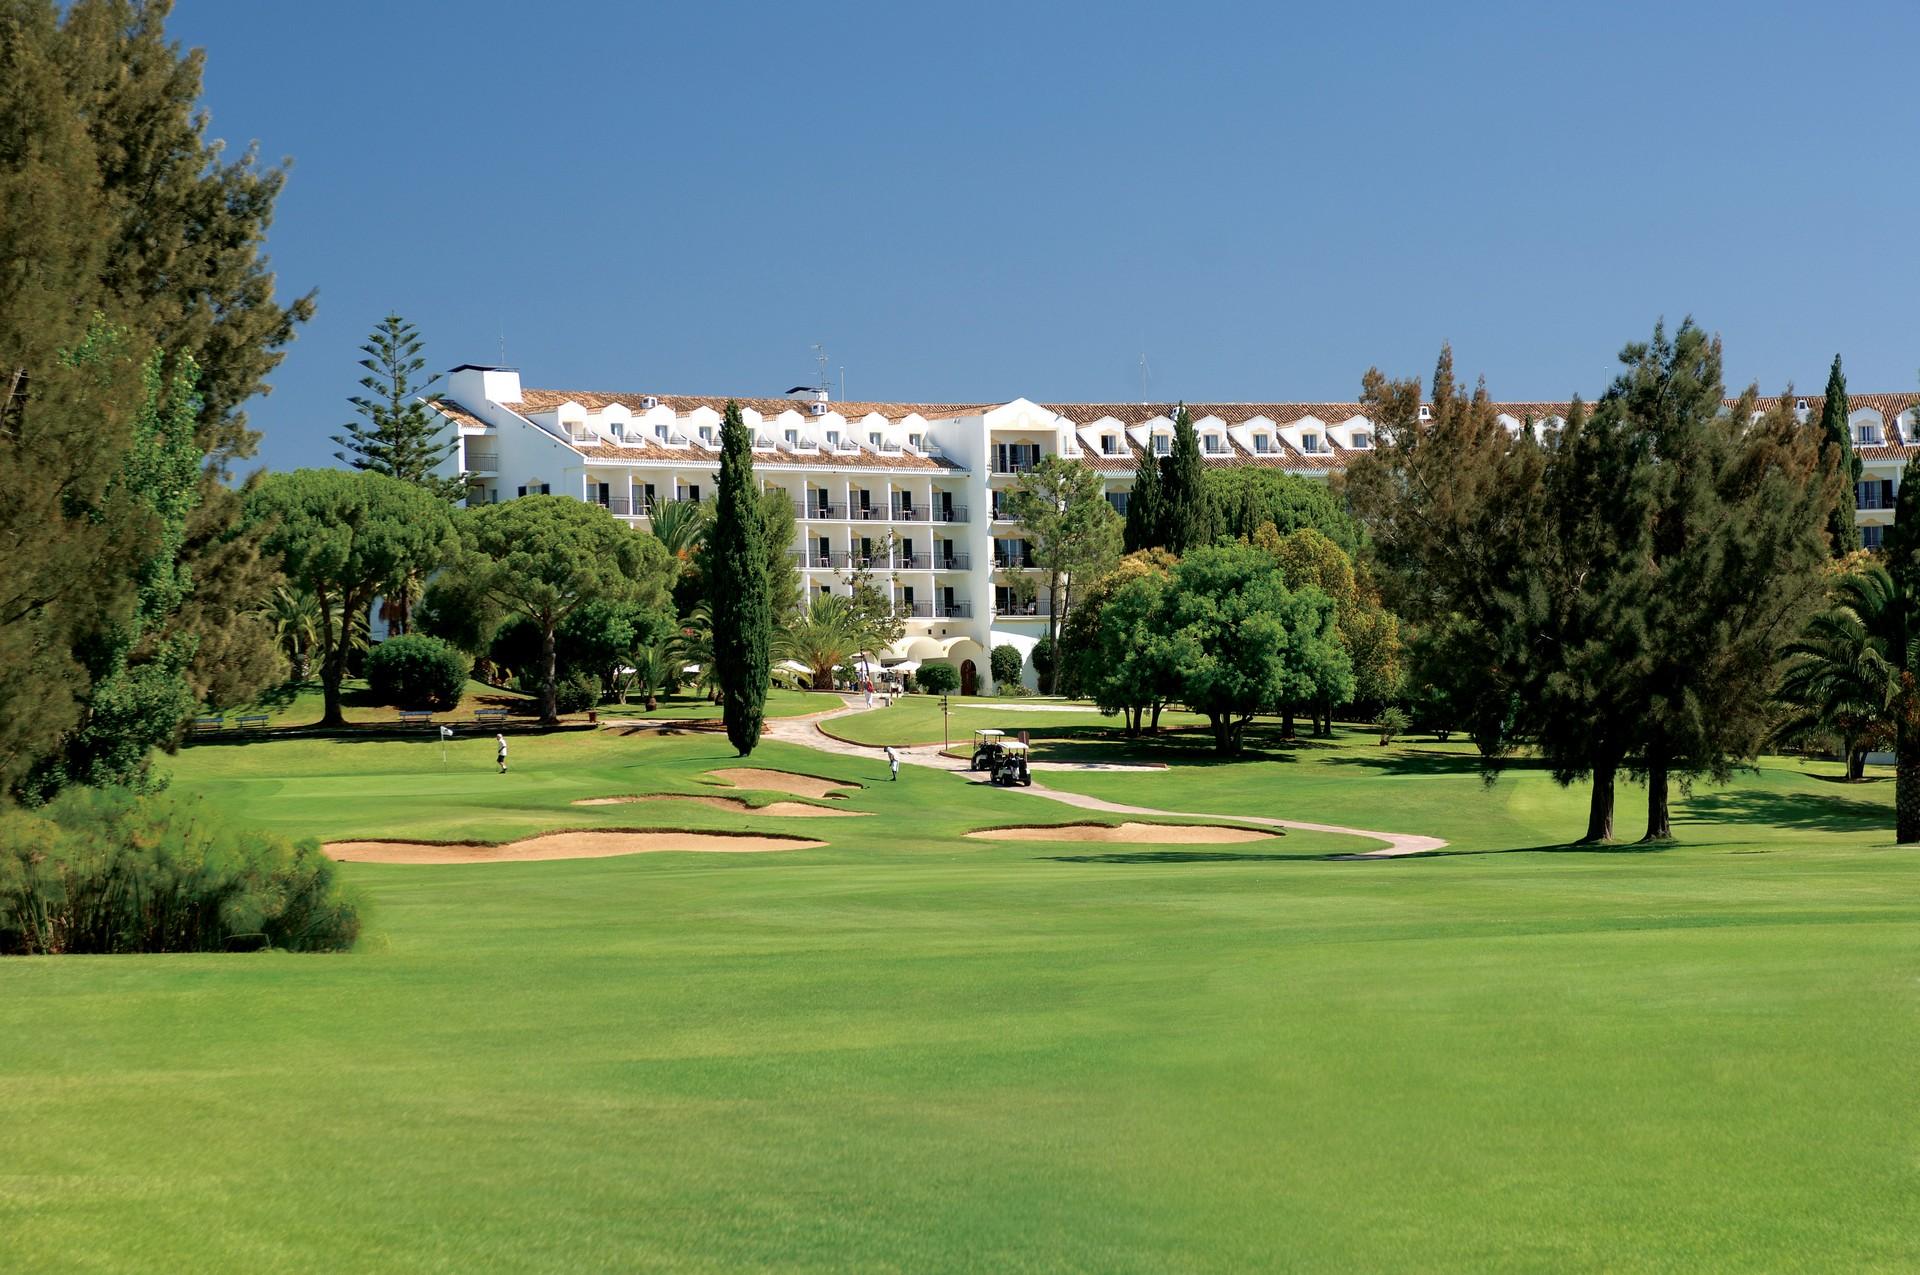 Portuguese golf clubs 4 portuguese golf clubs Portuguese golf clubs: The perfect place for you to relax Portuguese golf clubs 4